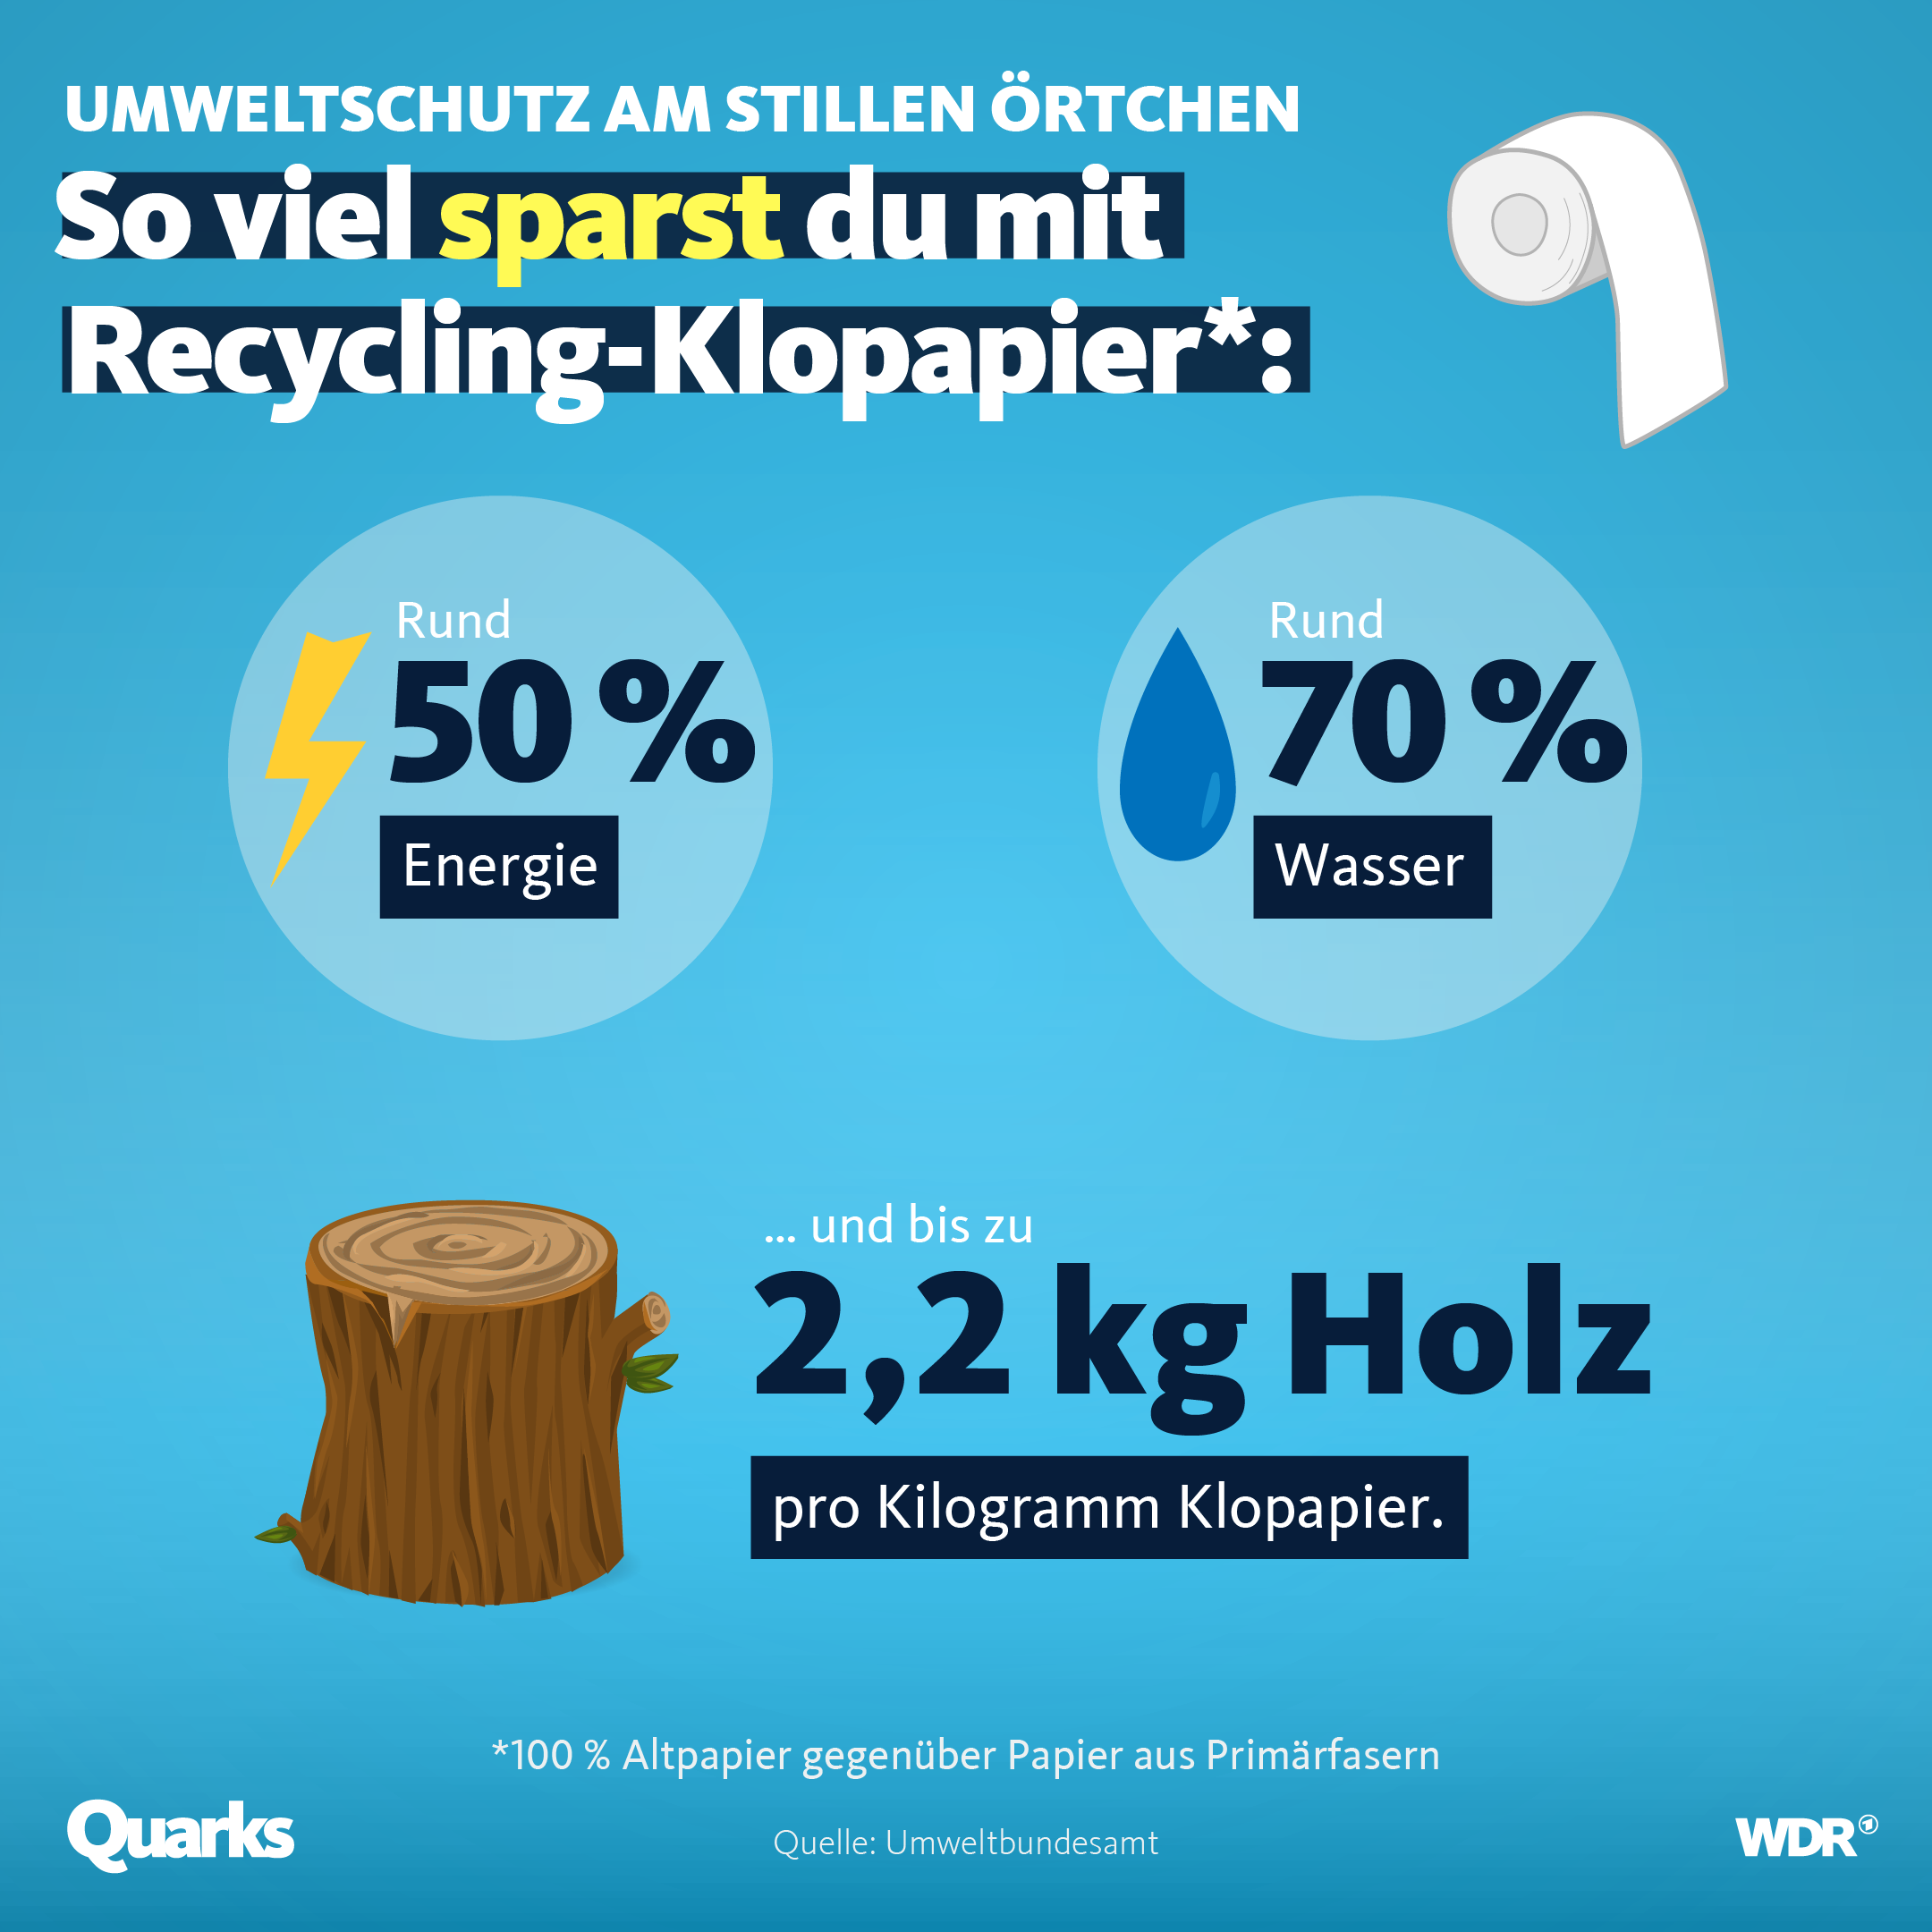 So viel sparst du mit Recycling-Klopapier